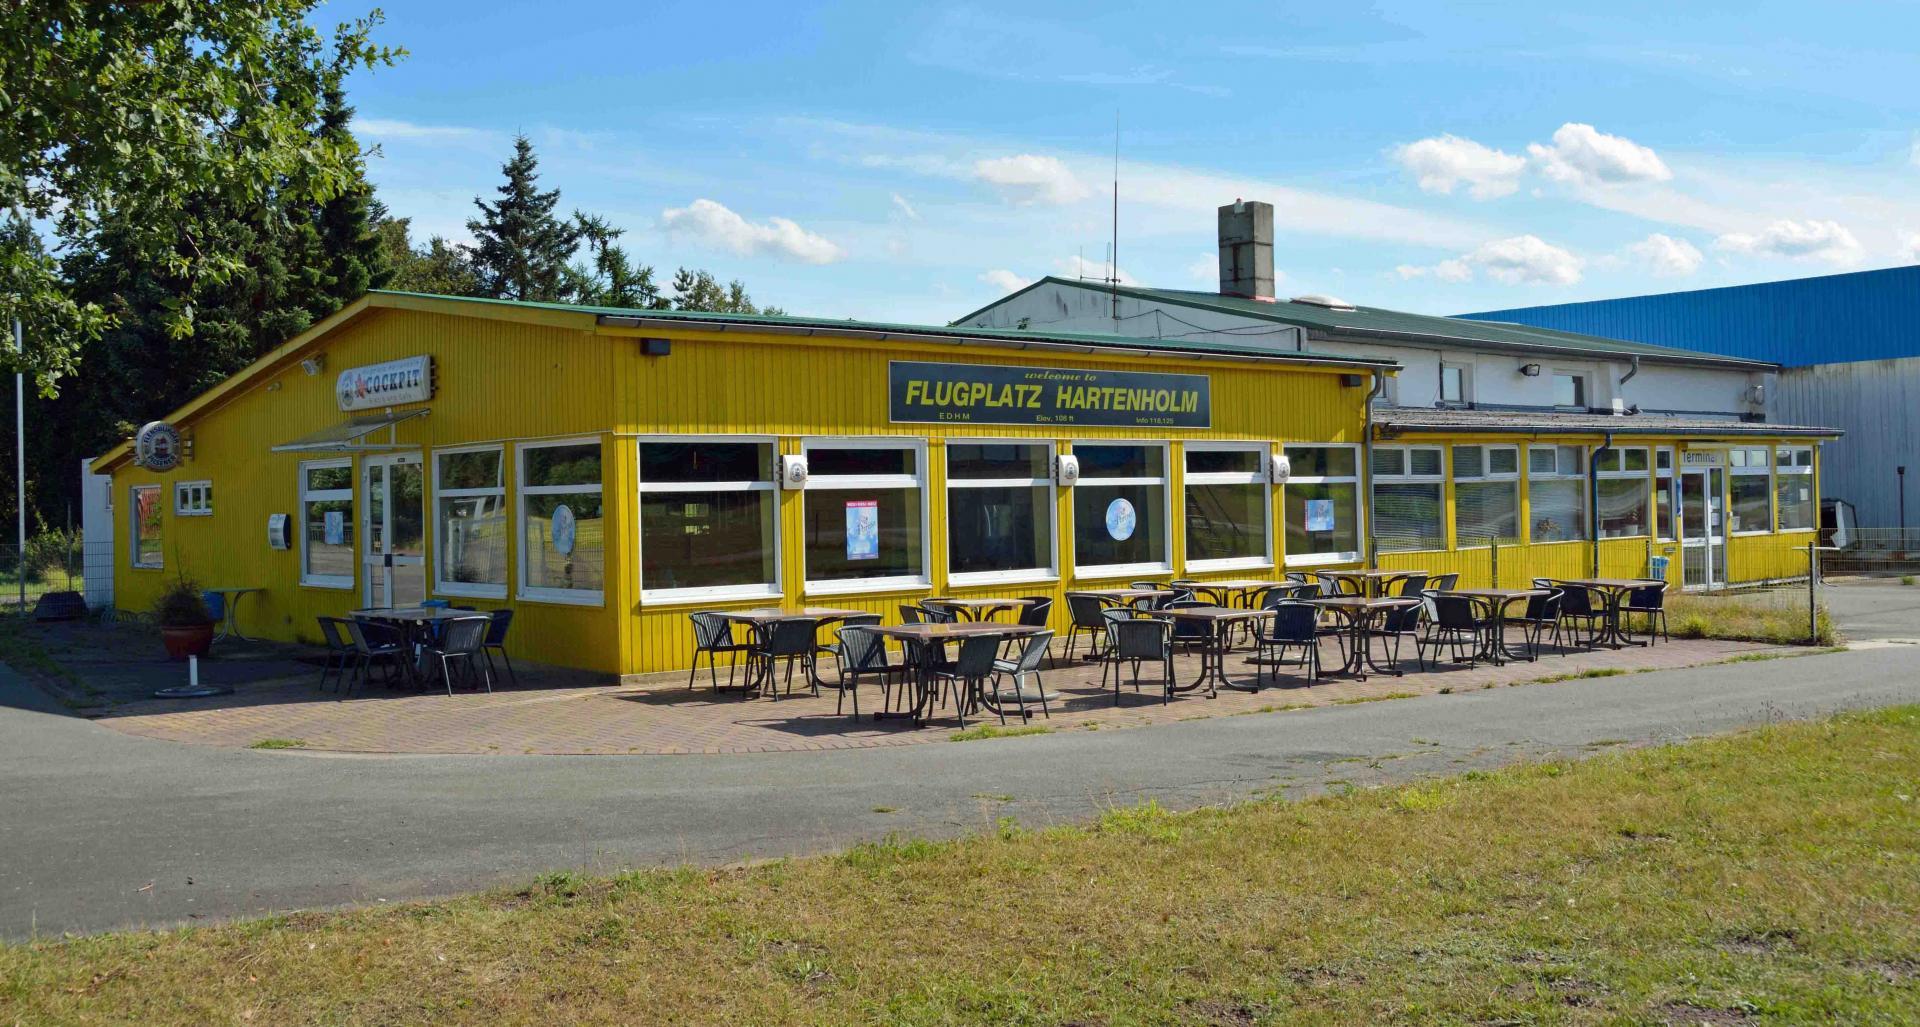 Flugplatzrestaurant Cockpit (2013)